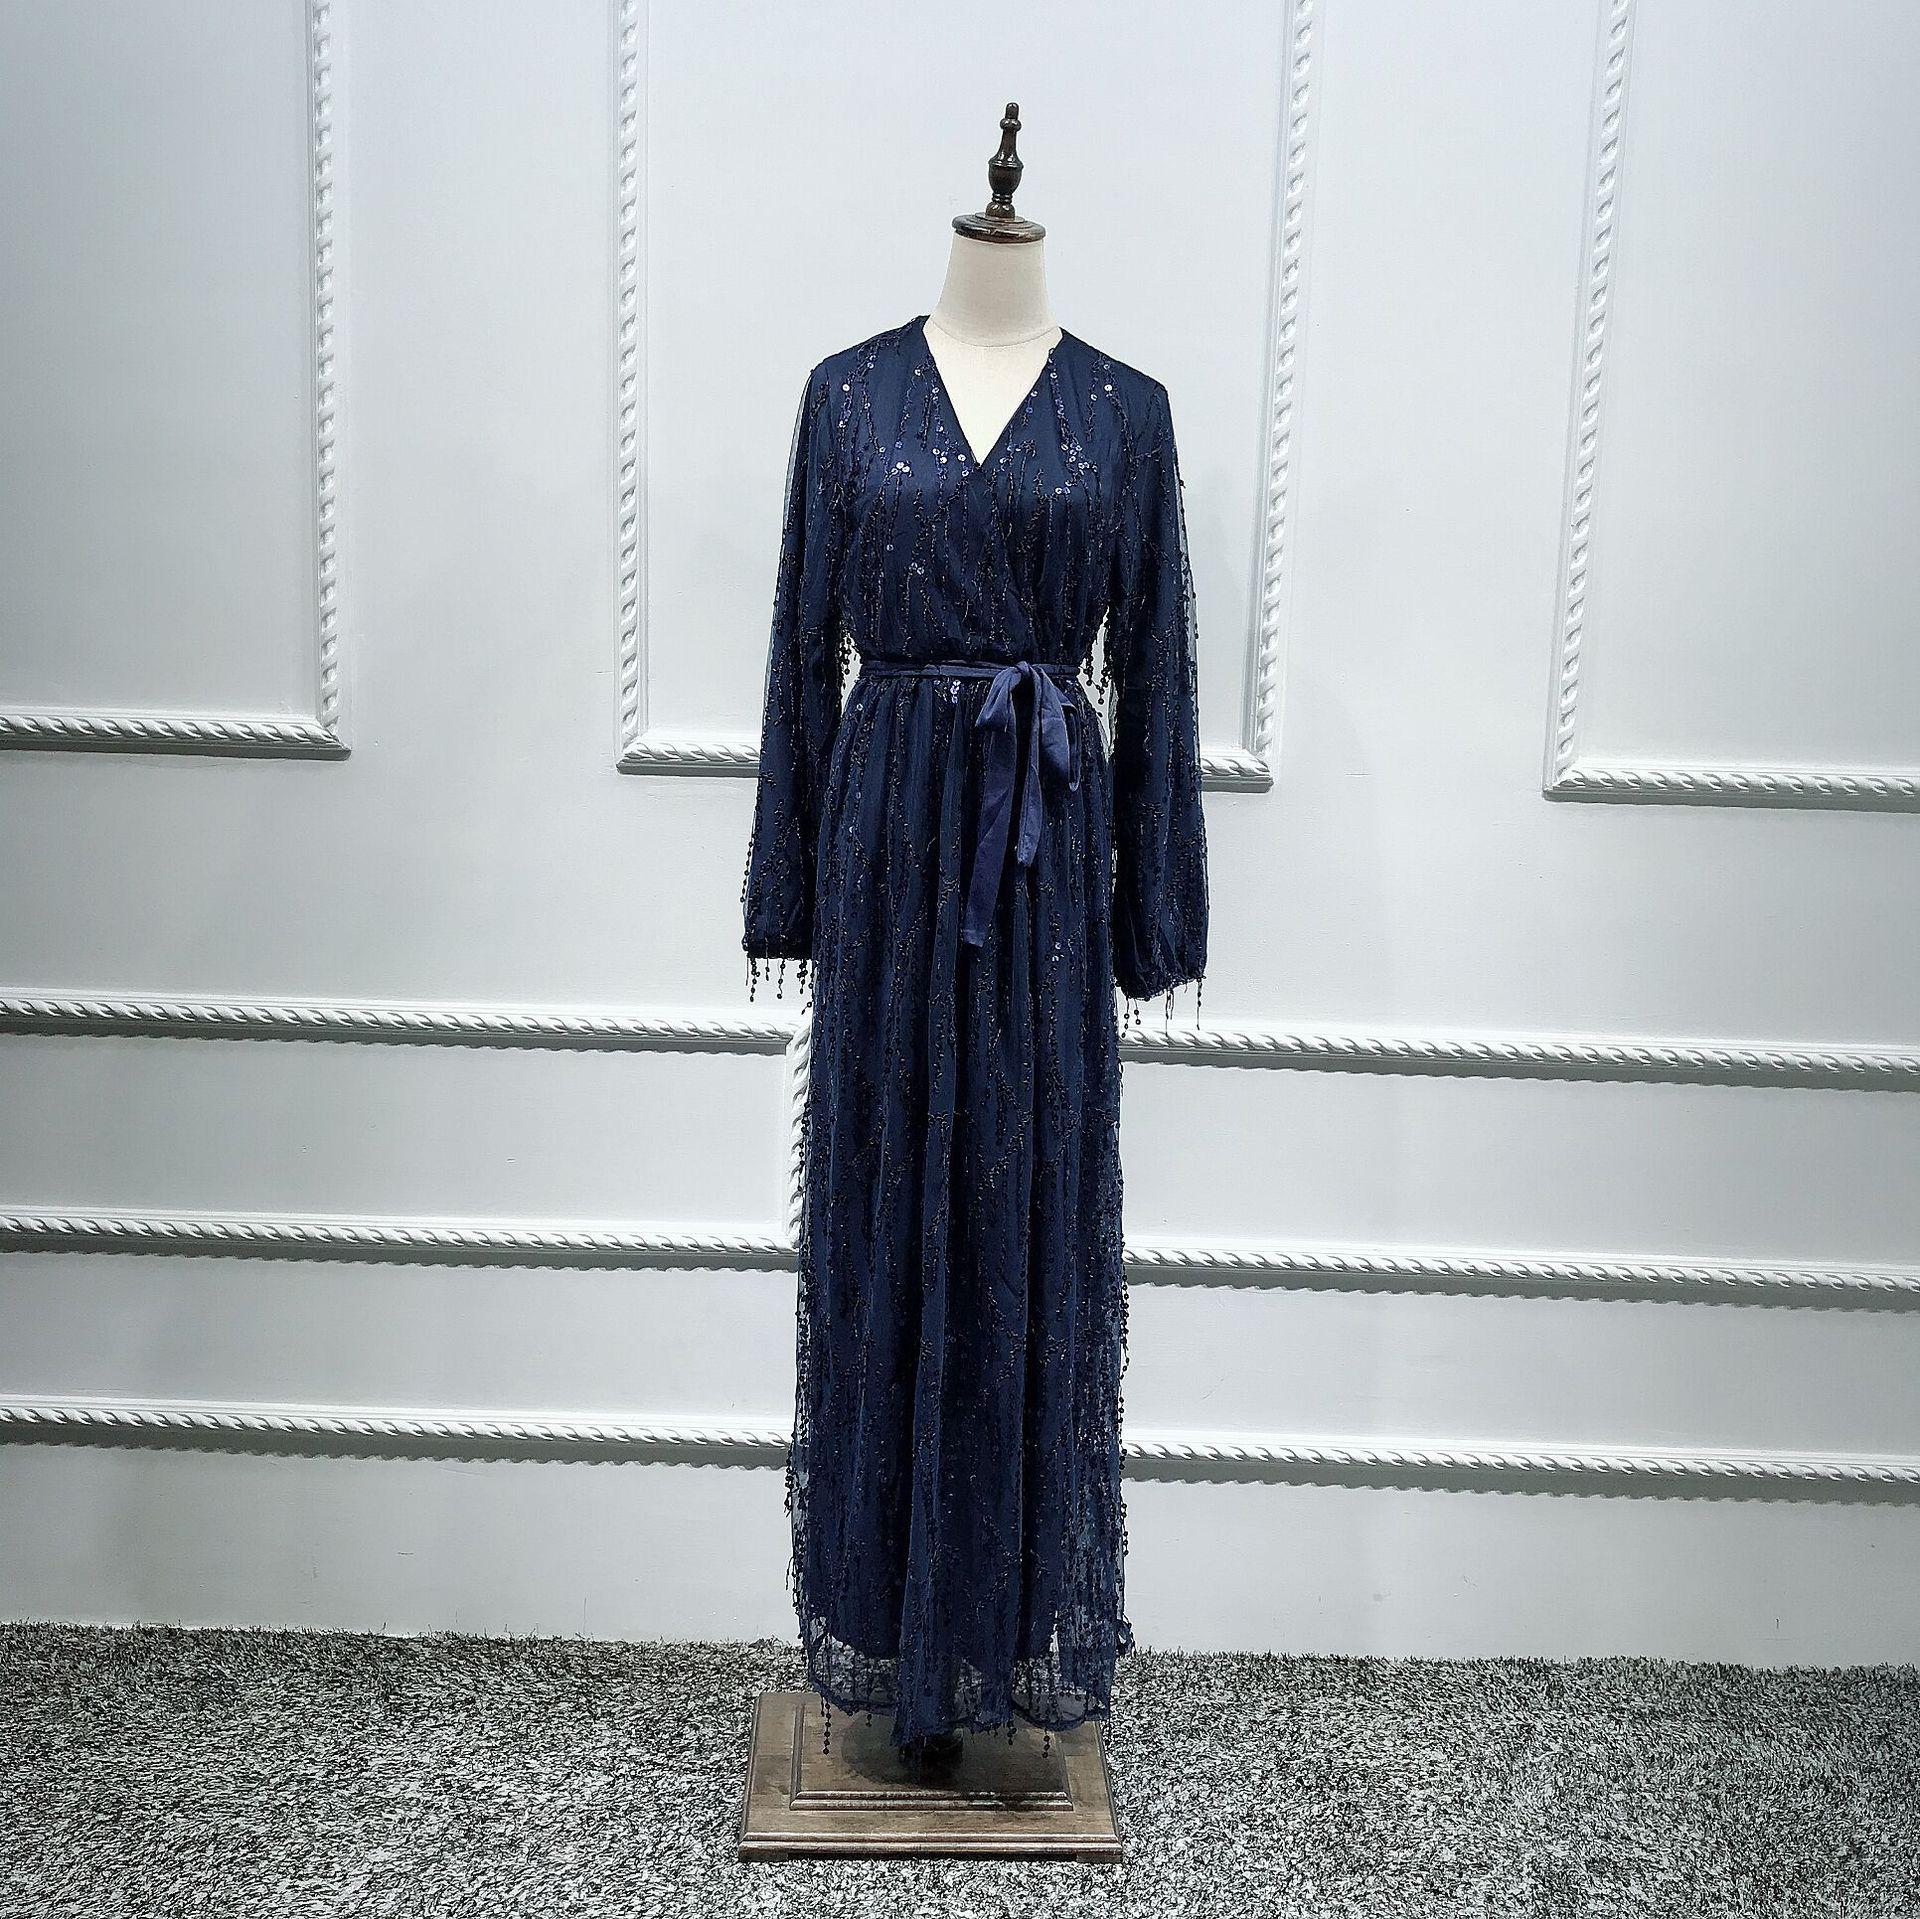 Image 5 - Fashion Sequin Tassel Abaya Turkish Dresses Hijab Muslim Dress Dubai Abayas for Women Caftan Marocain Kaftan Islamic ClothingIslamic Clothing   -